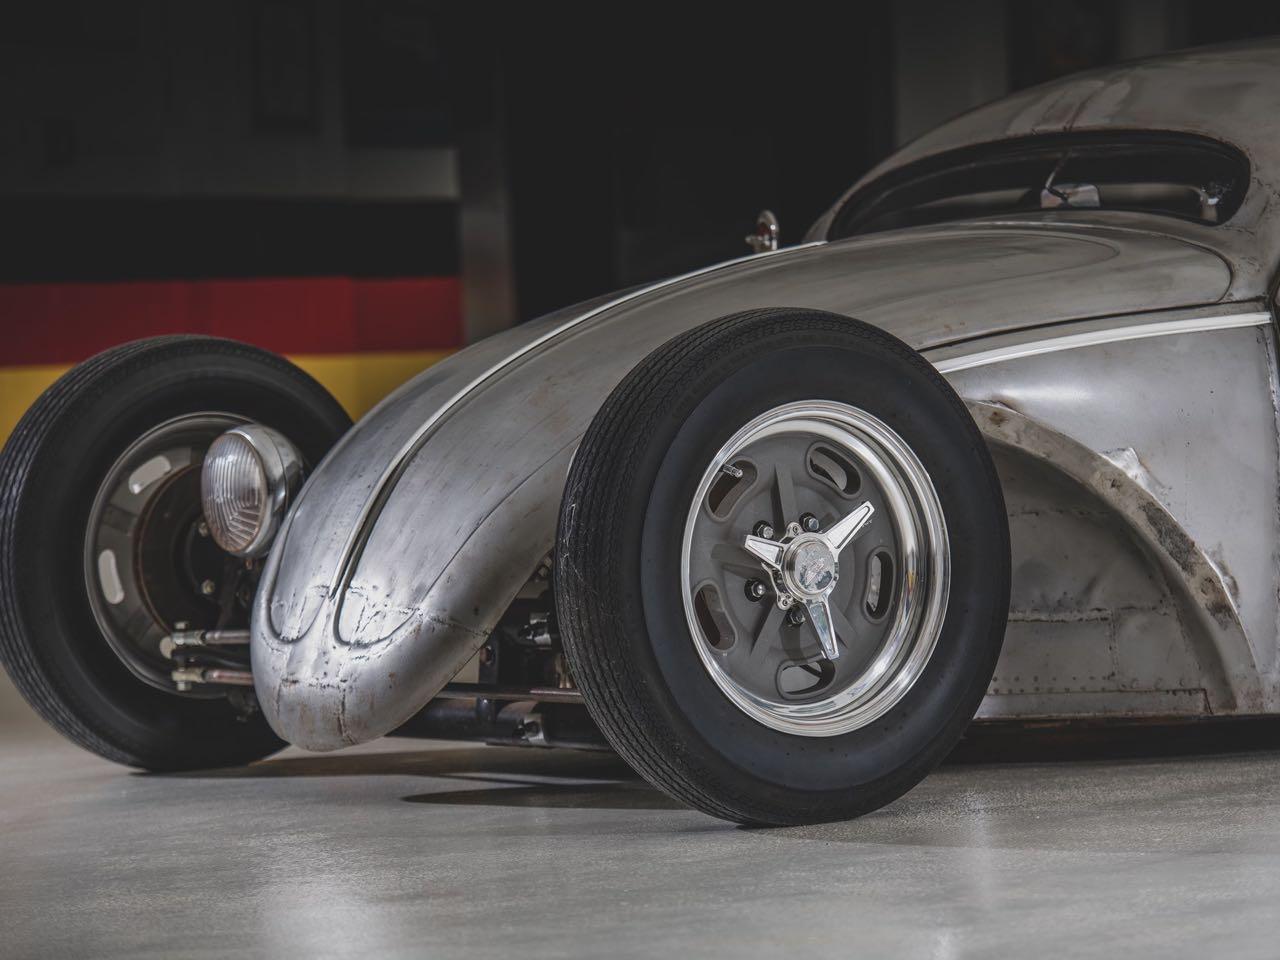 "'56 VW Beetle Outlaw ""Death"" by Franz Muhr - Heavy Metal ! 2"